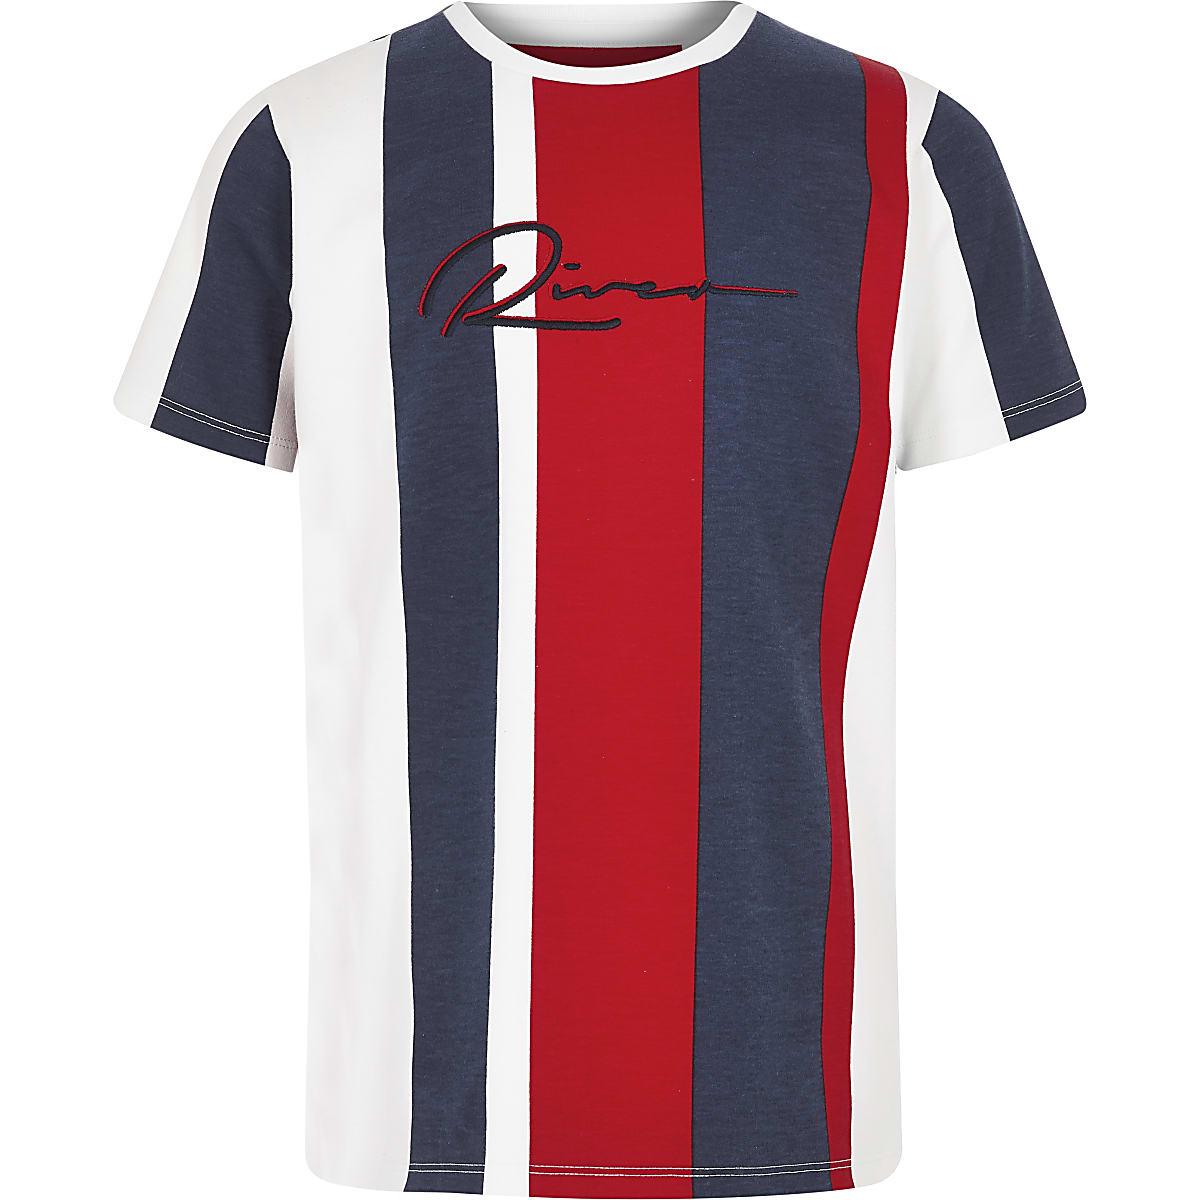 Boys navy stripe 'River' T-shirt